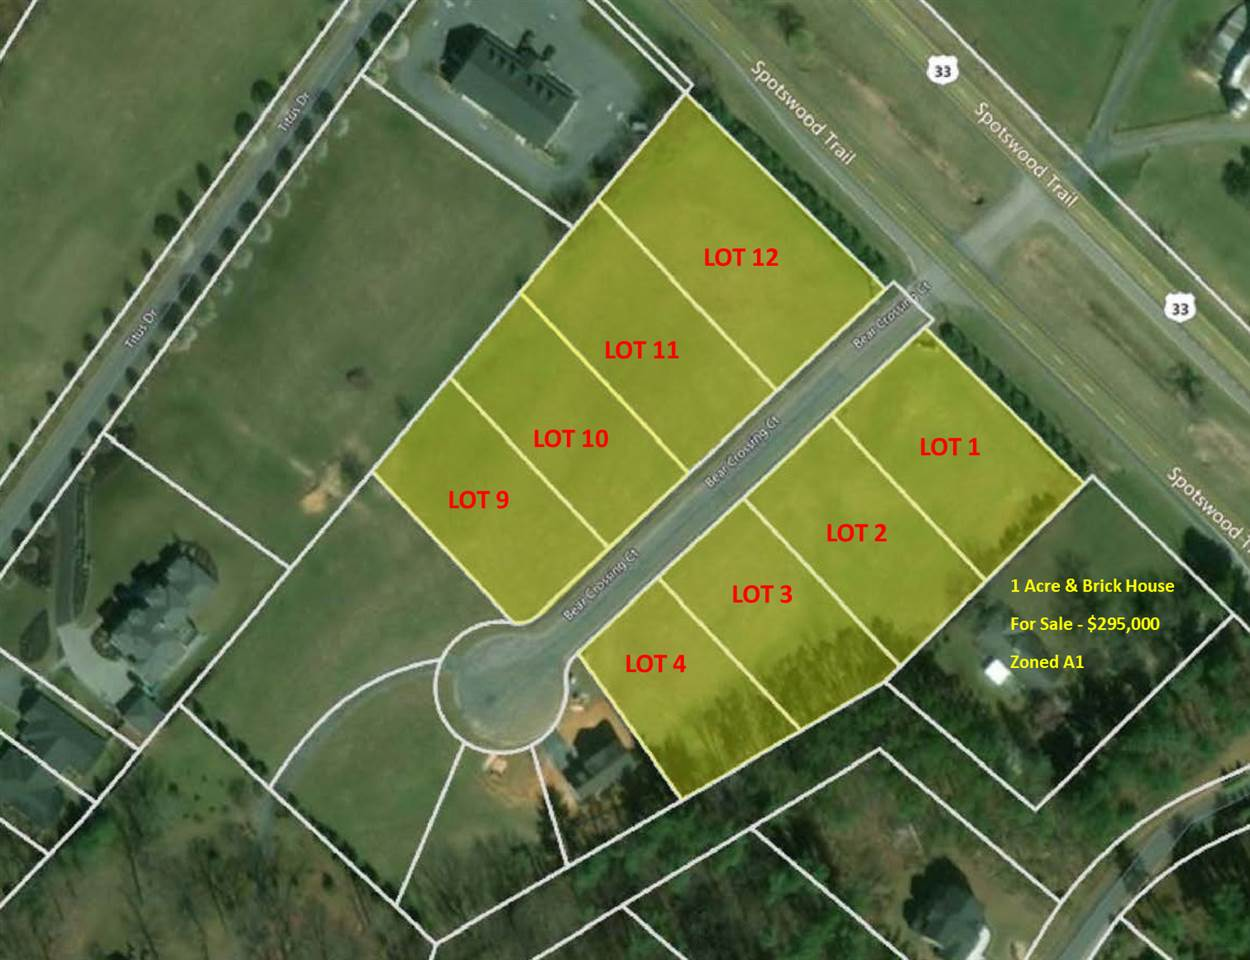 Lot 2 BEAR CROSSING CT, PENN LAIRD, VA 22846